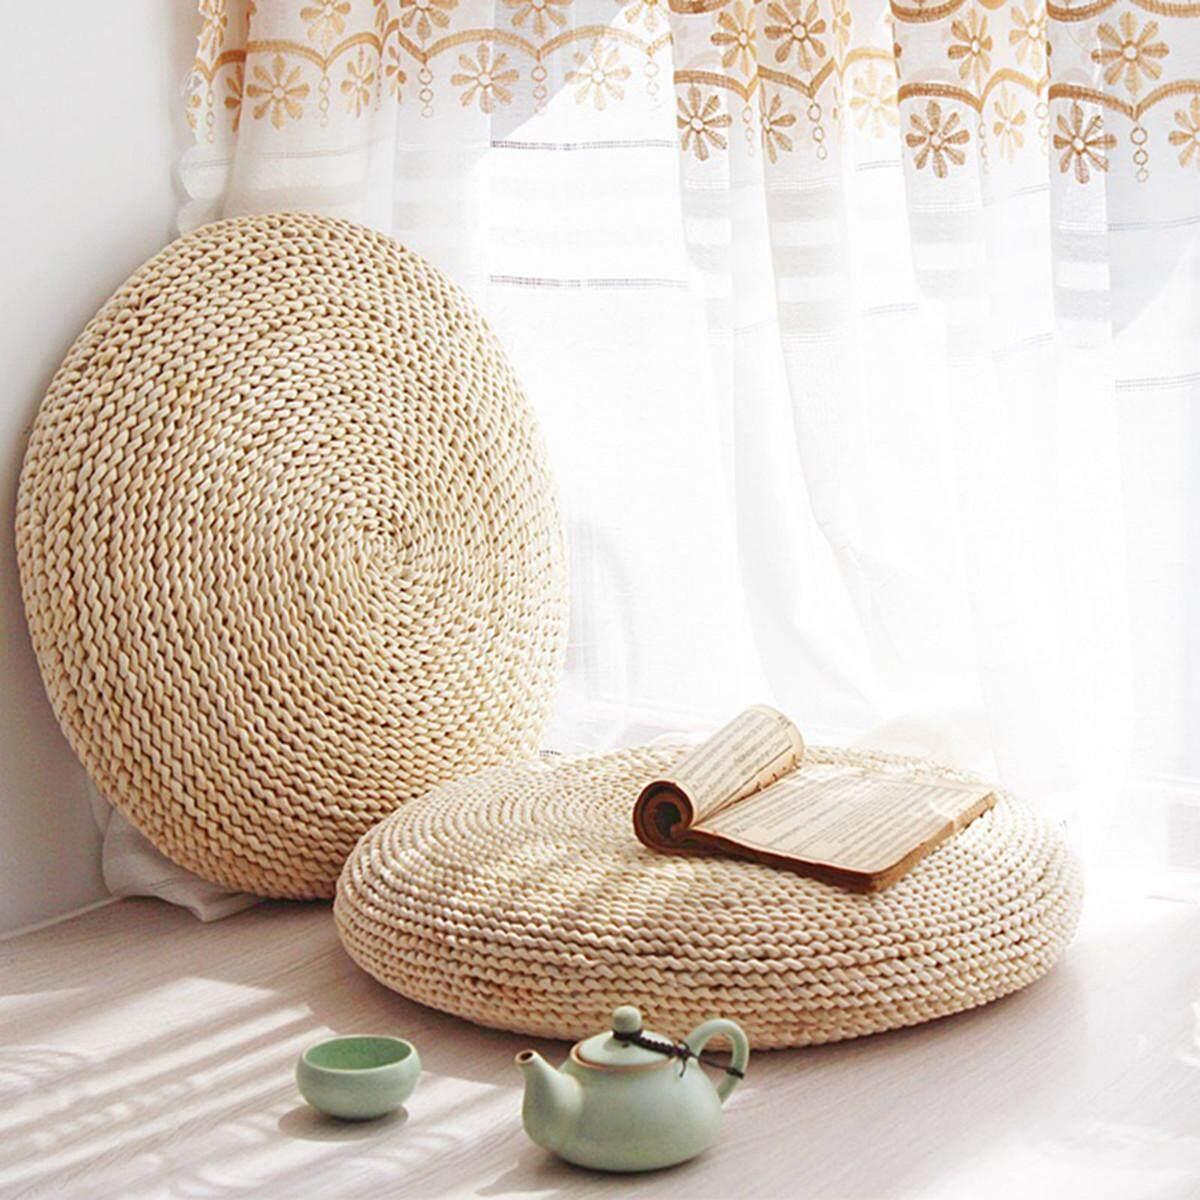 Round Straw Weave Handmade Pillow Floor Yoga Chair Seat Mat Tatami Cushion # 30cm